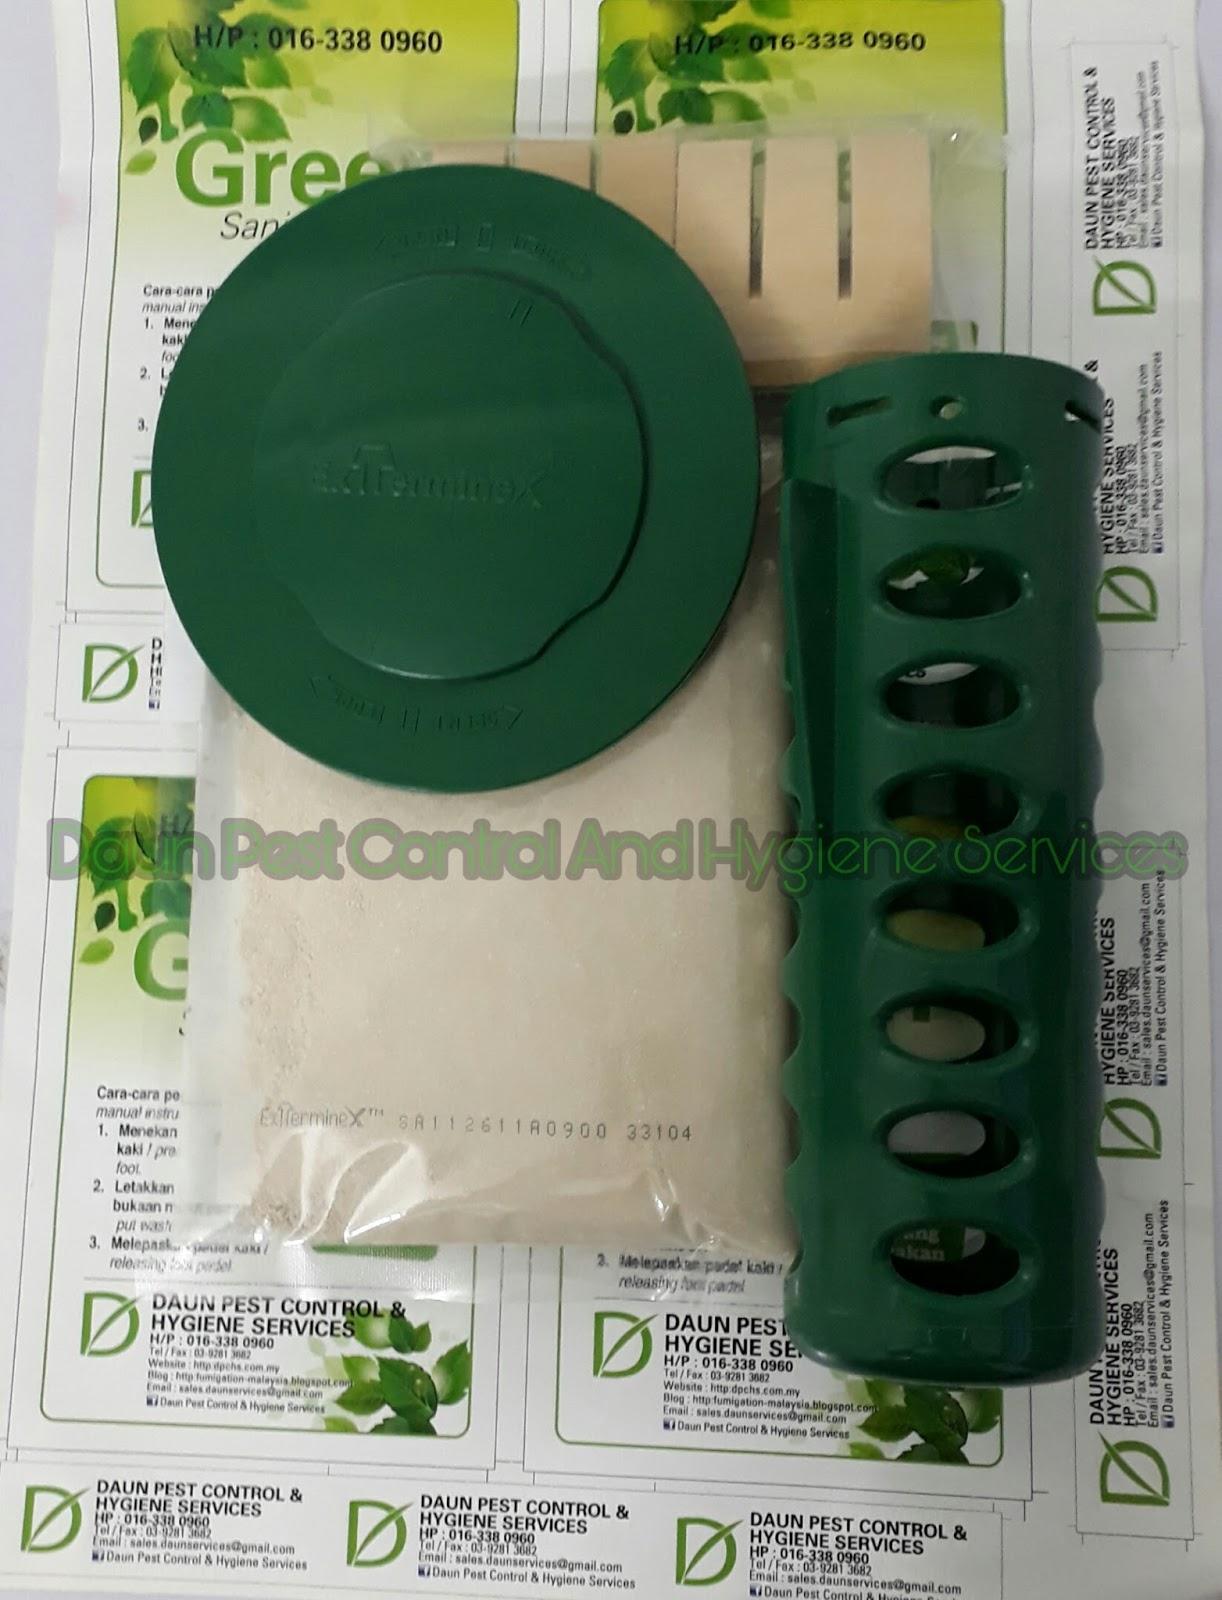 Daun Pest Control And Hygiene Services